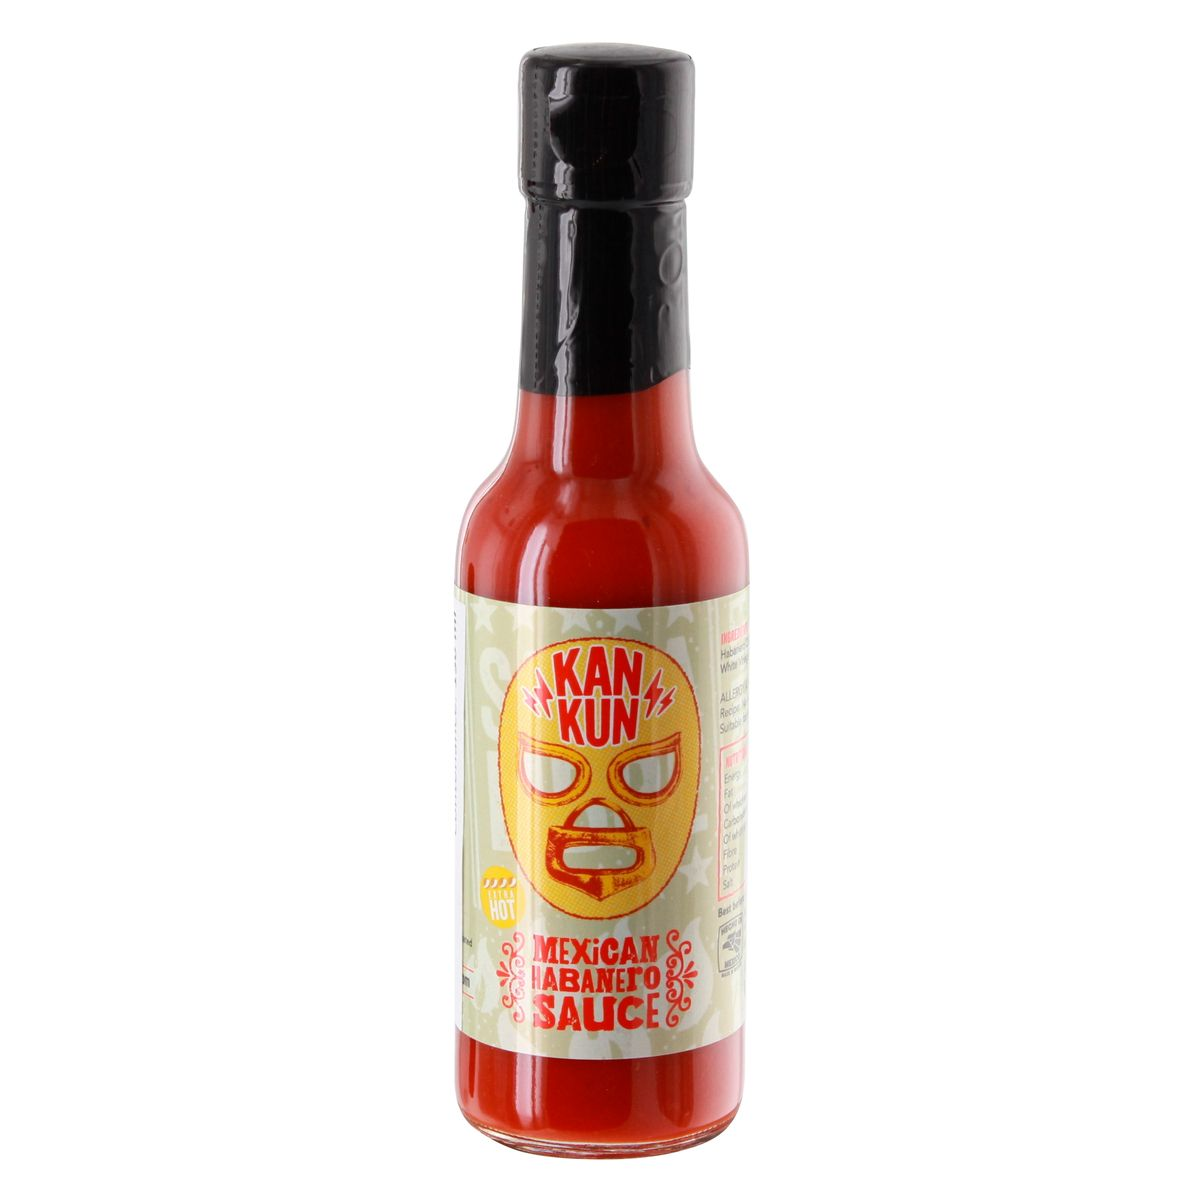 Habanero sauce - Kankun